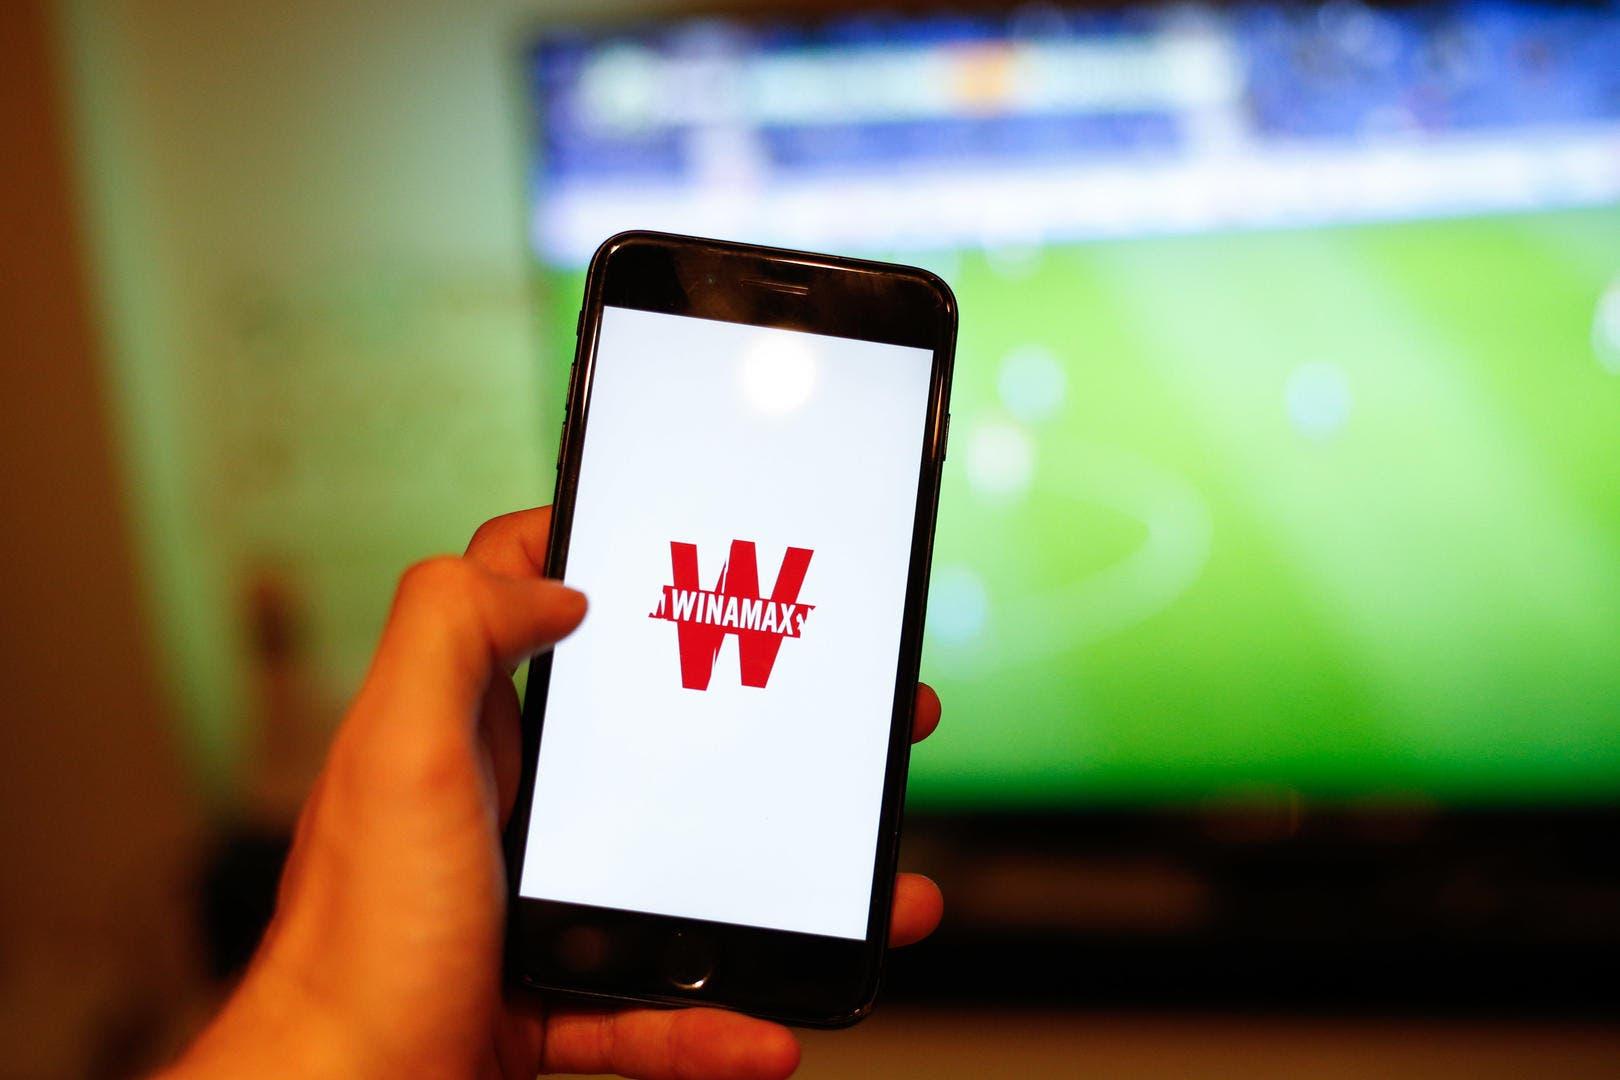 Winamax mobile sport